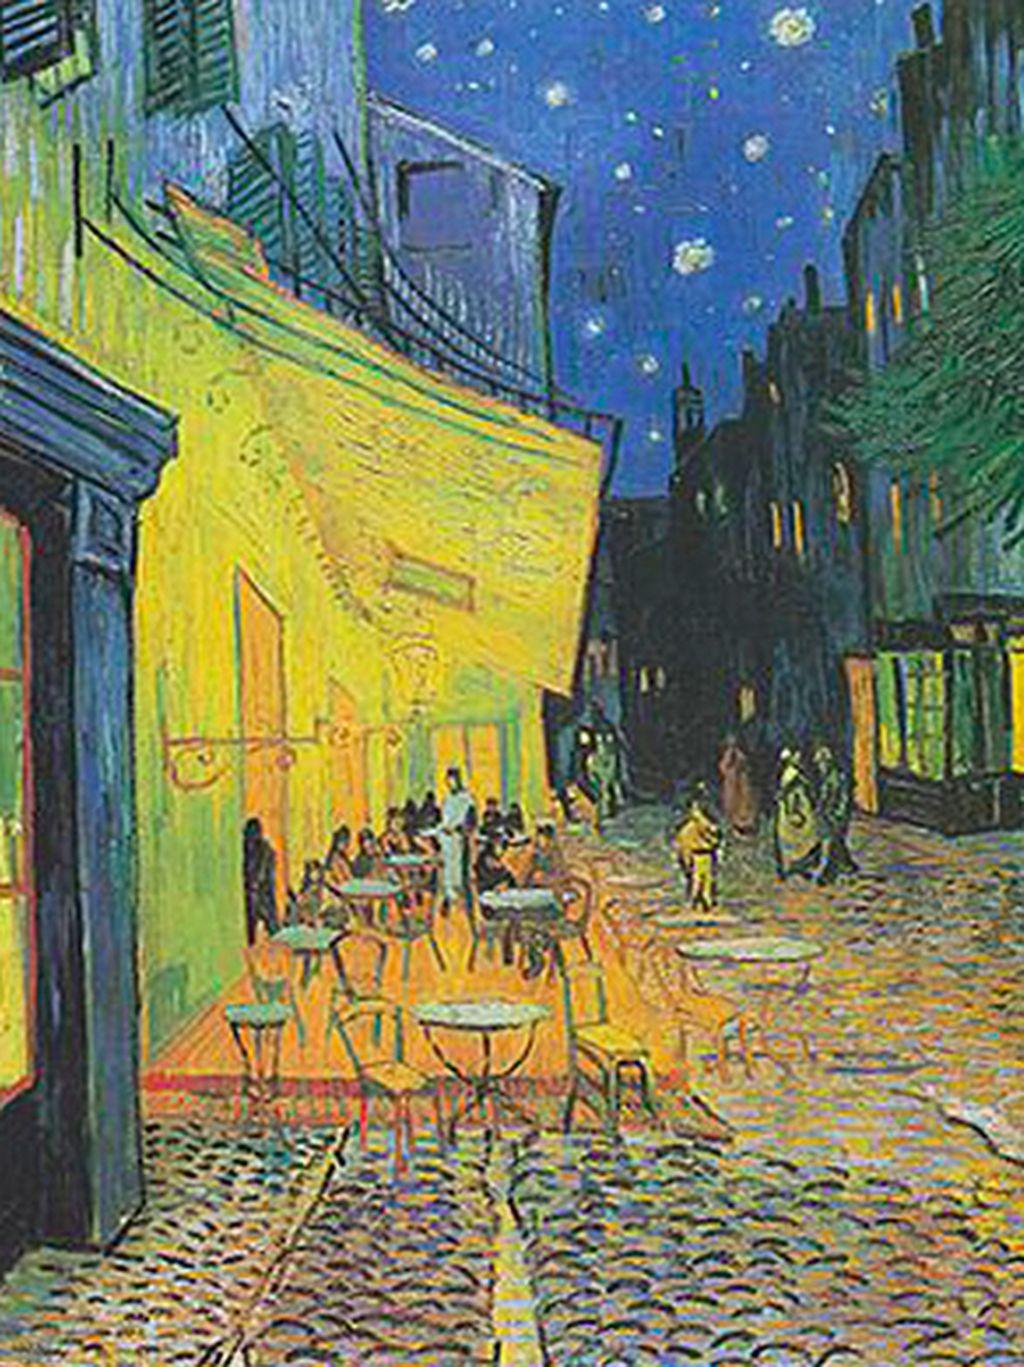 Adalah seniman bernama Yulia Pidlubnyak yang mereka ulang lukisan legendaris menjadi seperti nyata gaya 3 dimensi. Ini adalah lukisan Cafe Terrace At Night oleh Vincent Van Gogh. Foto: boredpanda